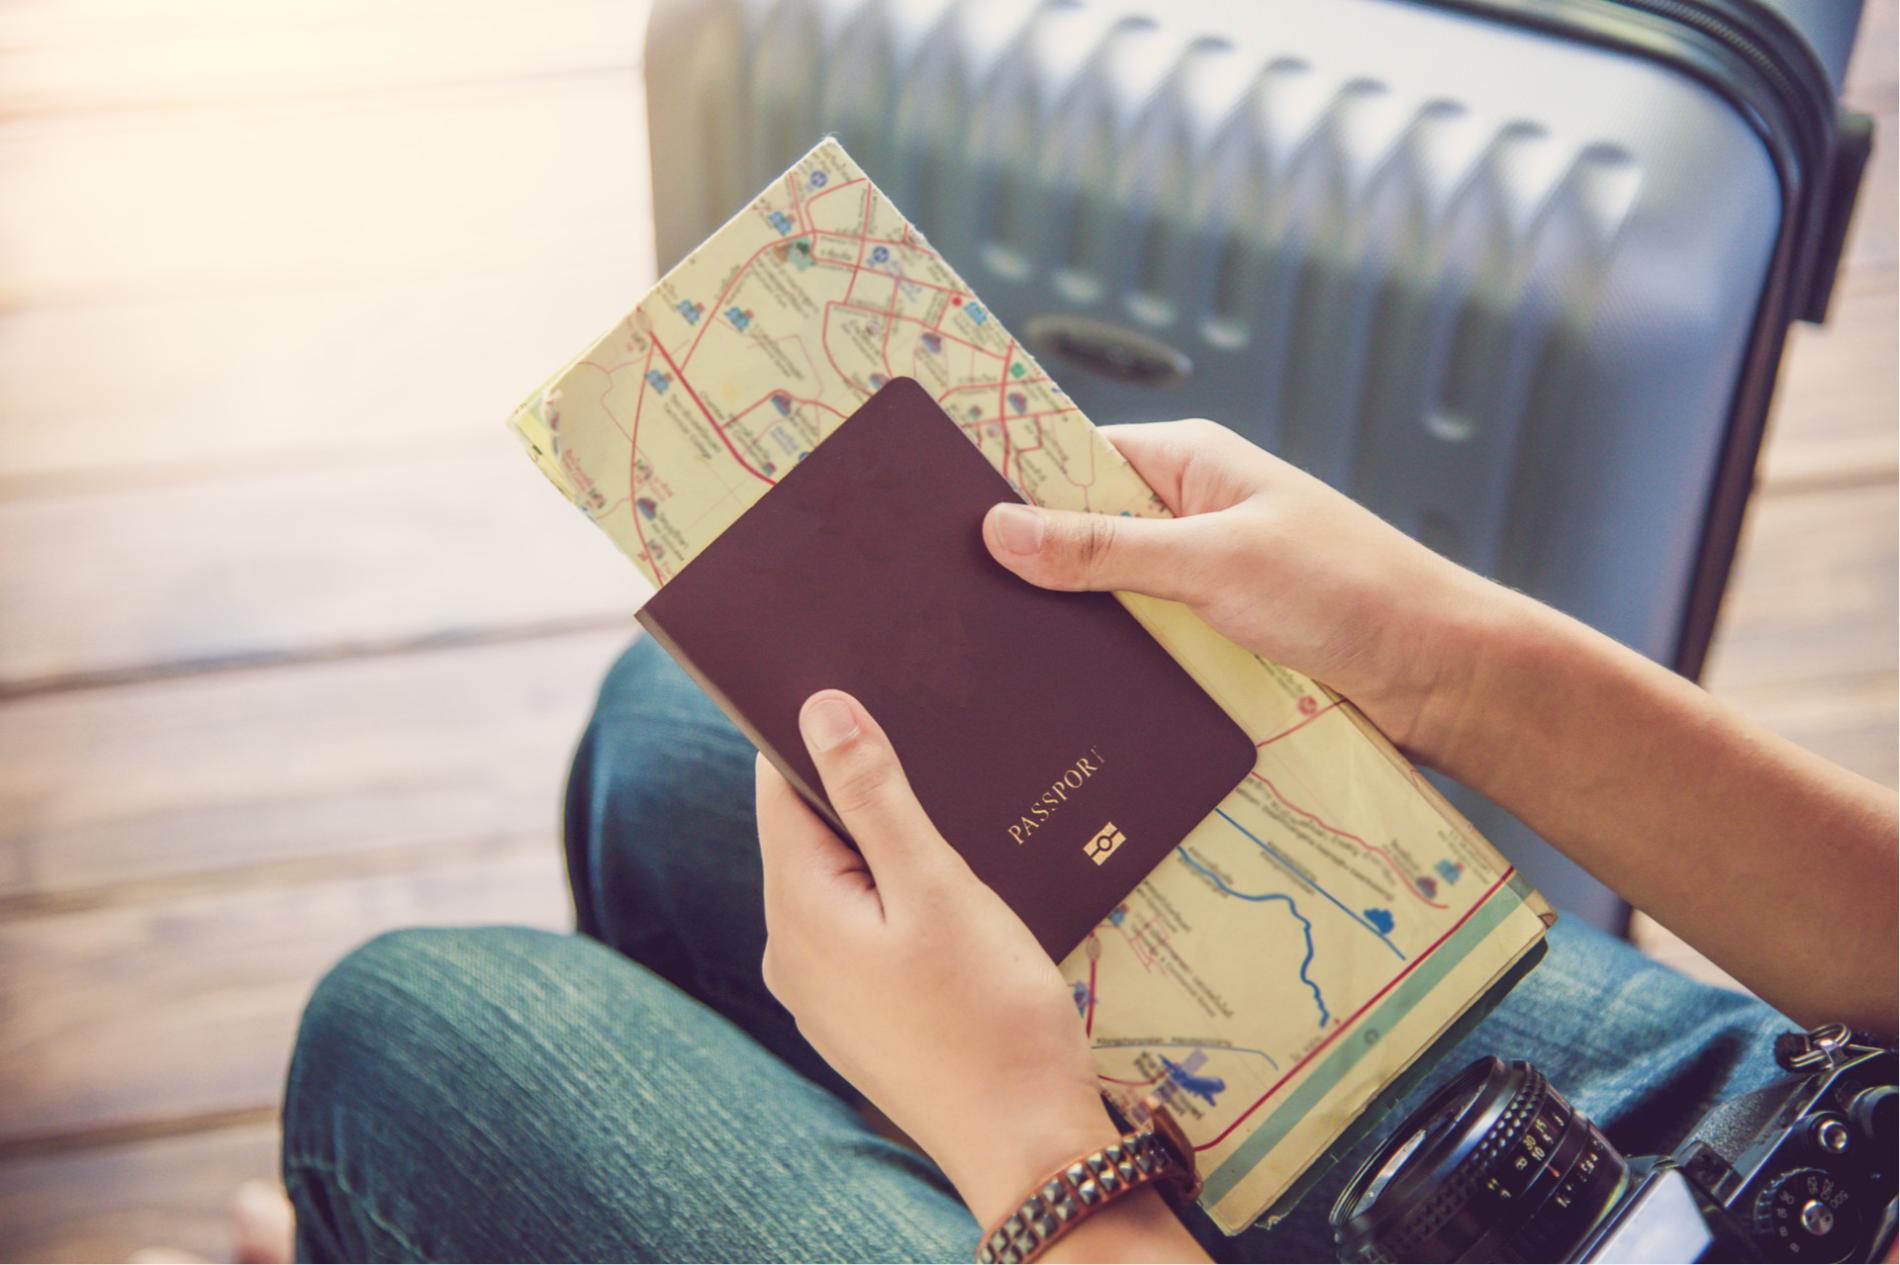 Pasaporte y plano de viaje en Fitur de IFEMA